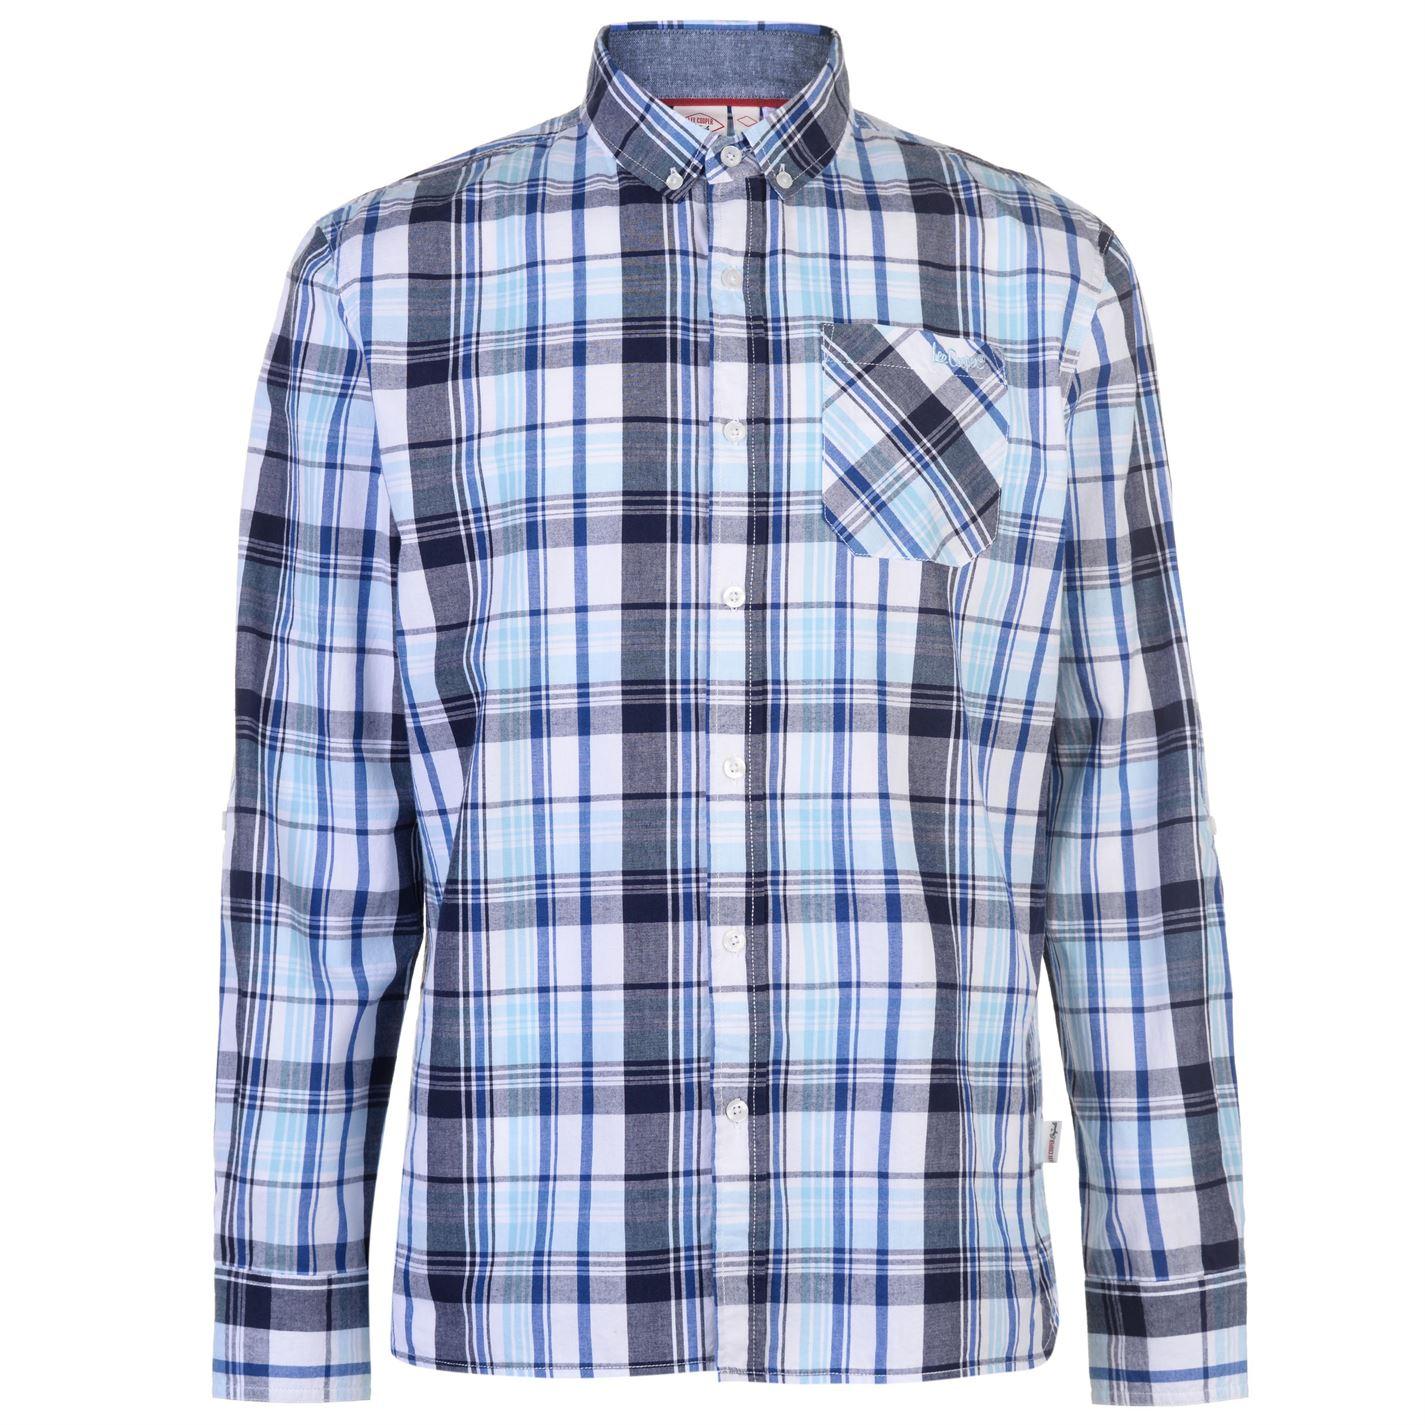 Lee Cooper Long Sleeve Check Pánská košile 55842793 SD_Large